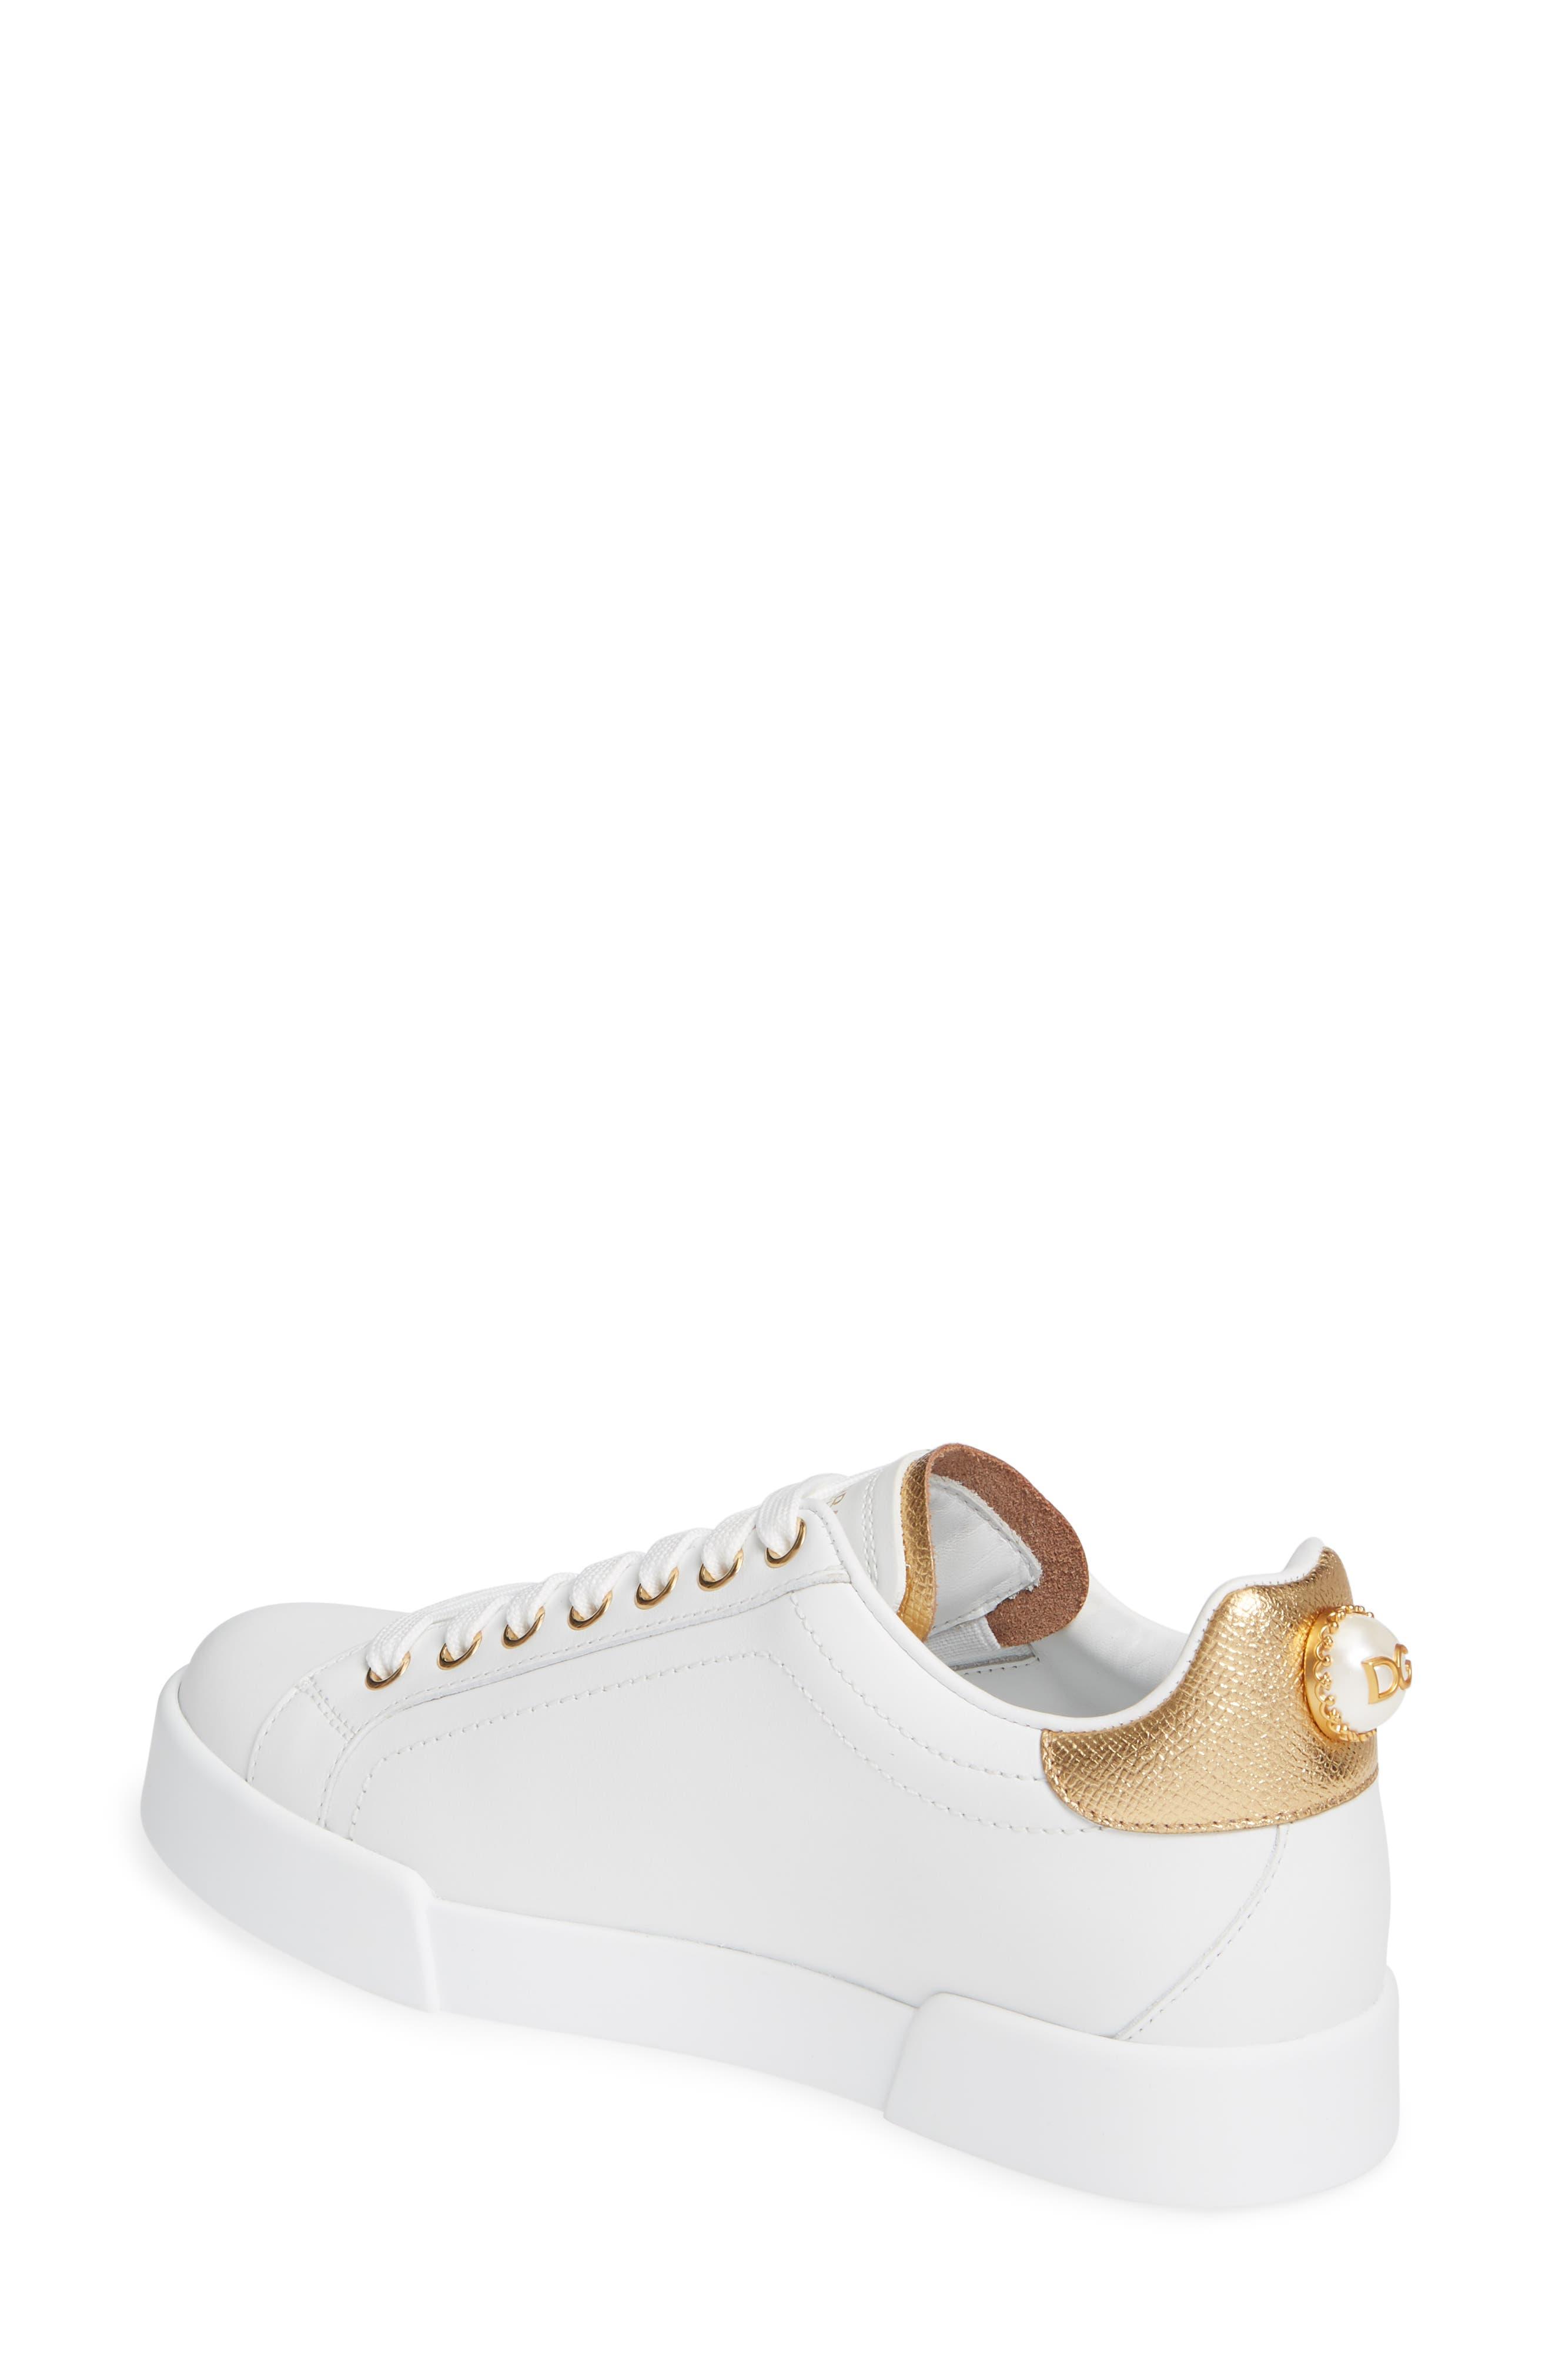 DOLCE&GABBANA, Portofino Embellished Sneaker, Alternate thumbnail 2, color, WHITE/ GOLD